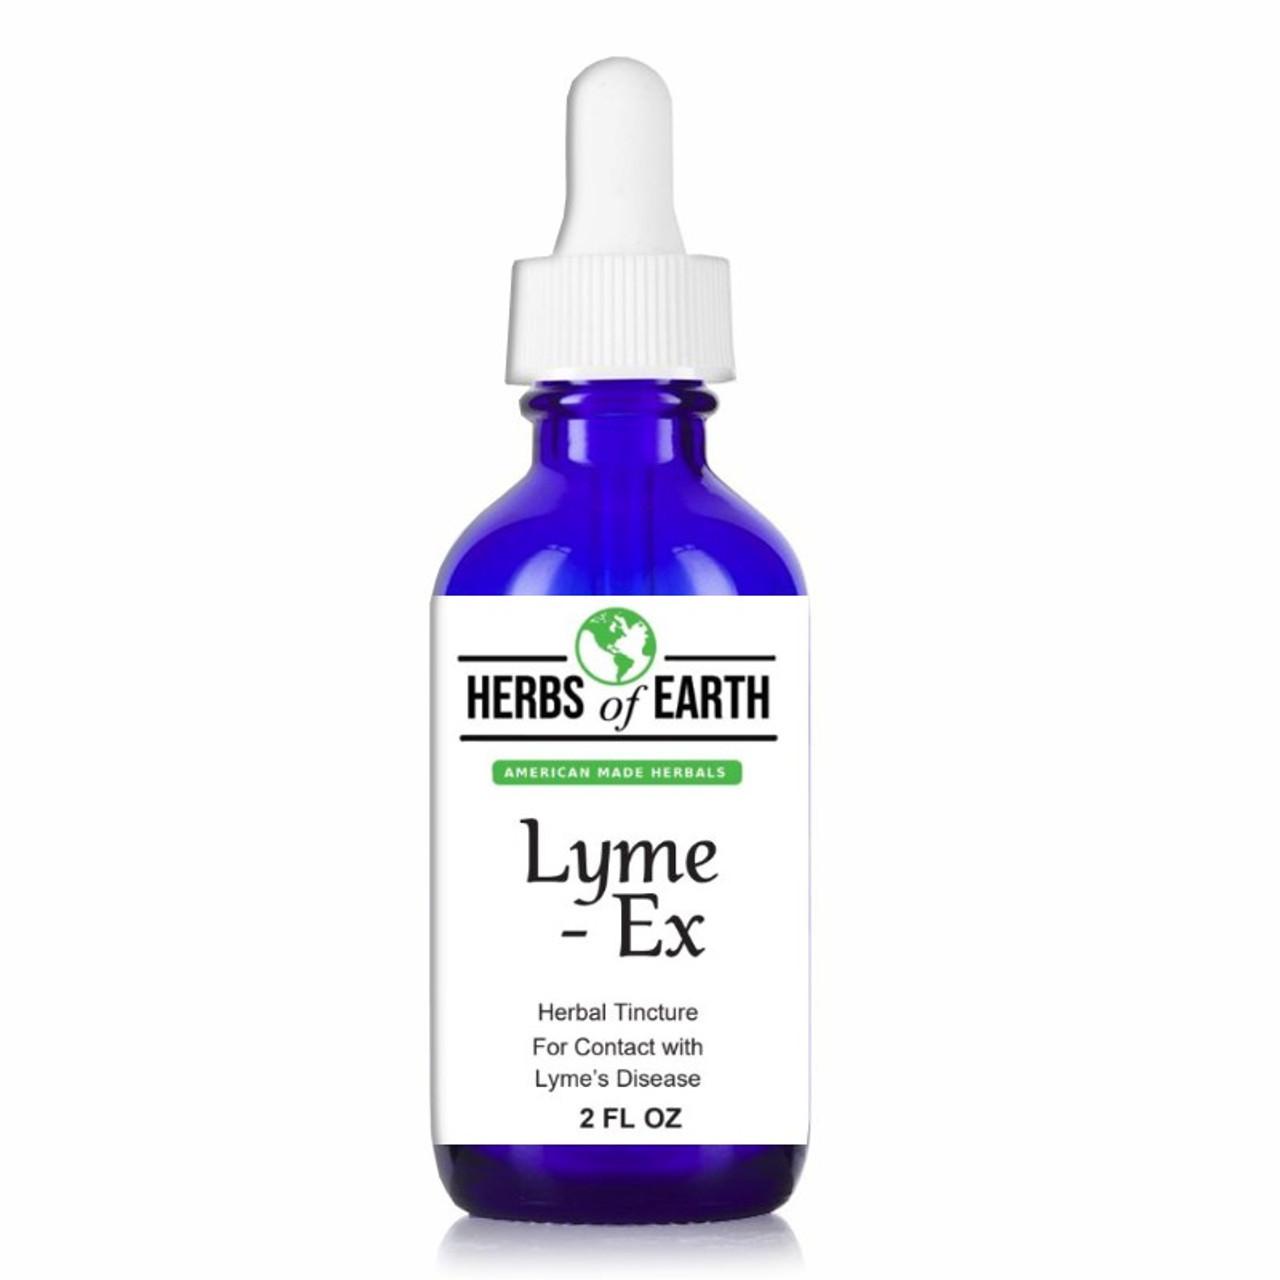 Lyme-Ex Herbal Tincture